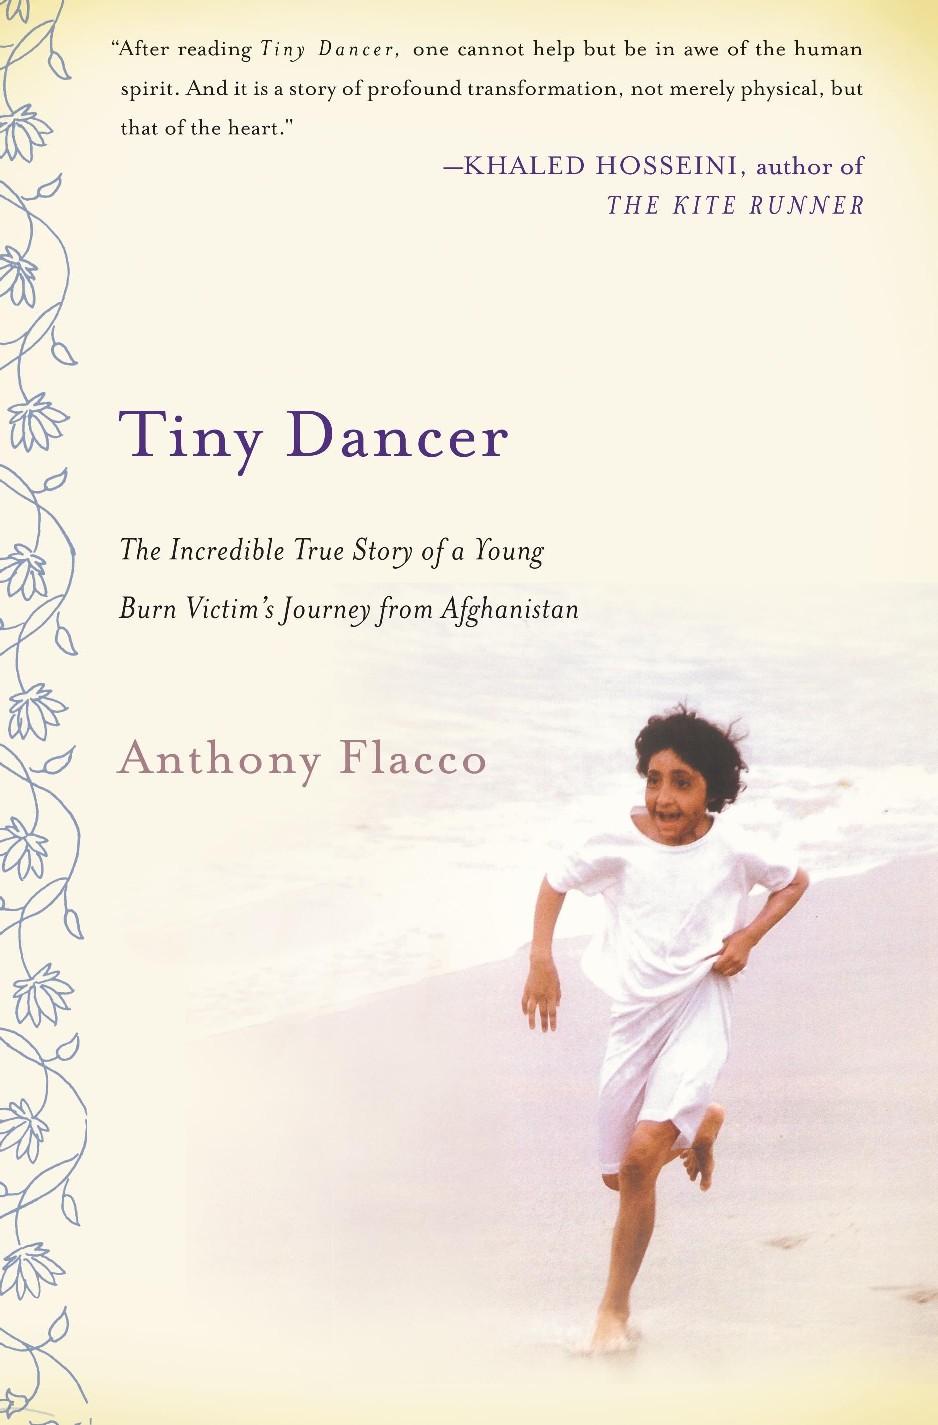 Tiny Dancercover2_300.jpg